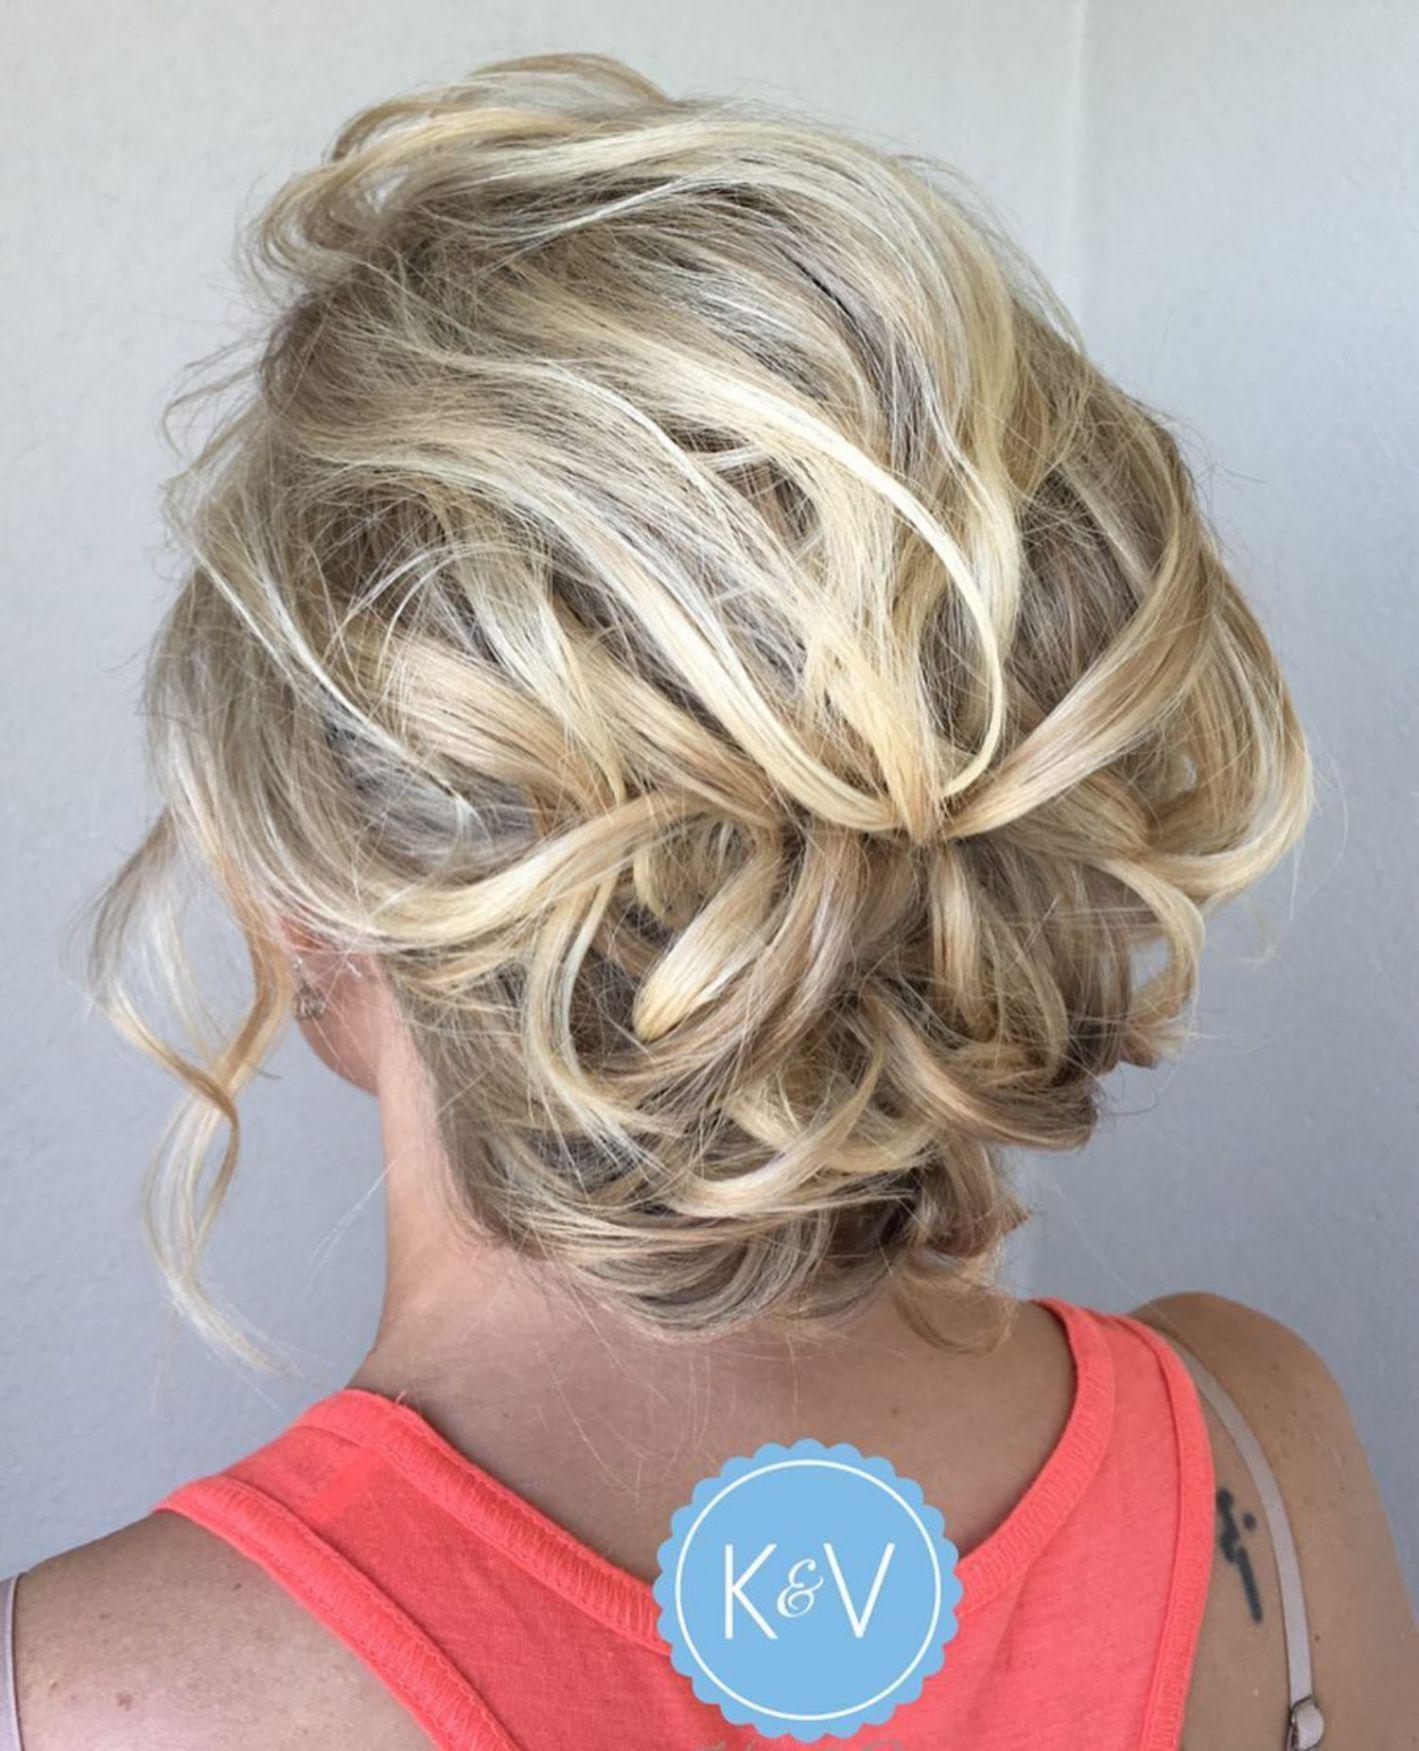 60 Creative Updo Ideas For Short Hair Short Hair Diy Hairdos For Short Hair Short Wedding Hair